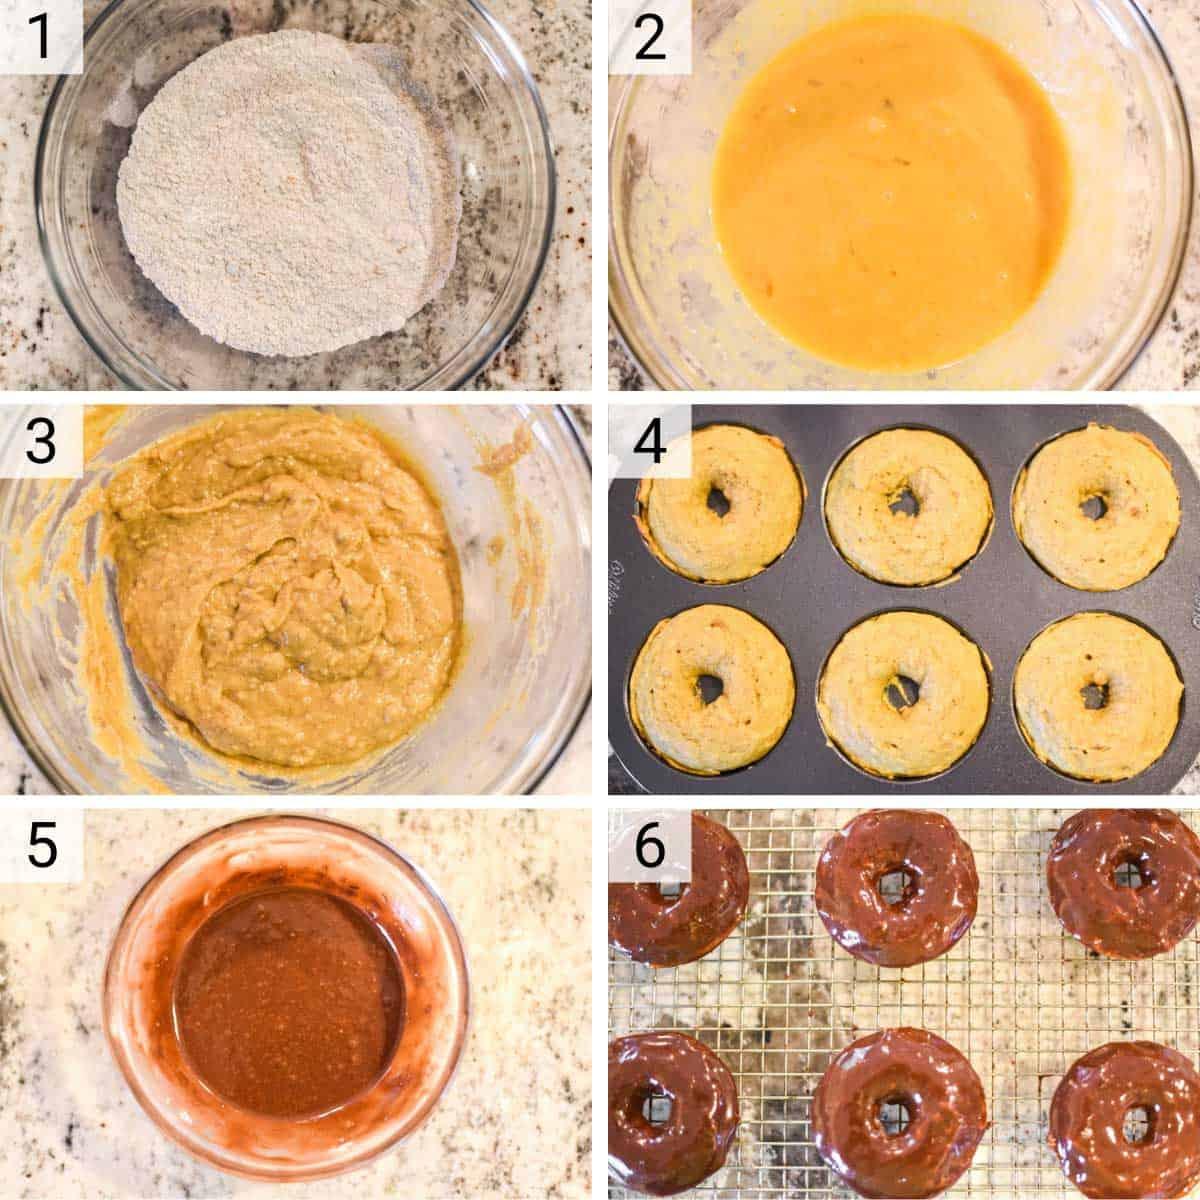 process shots of how to make pumpkin donuts